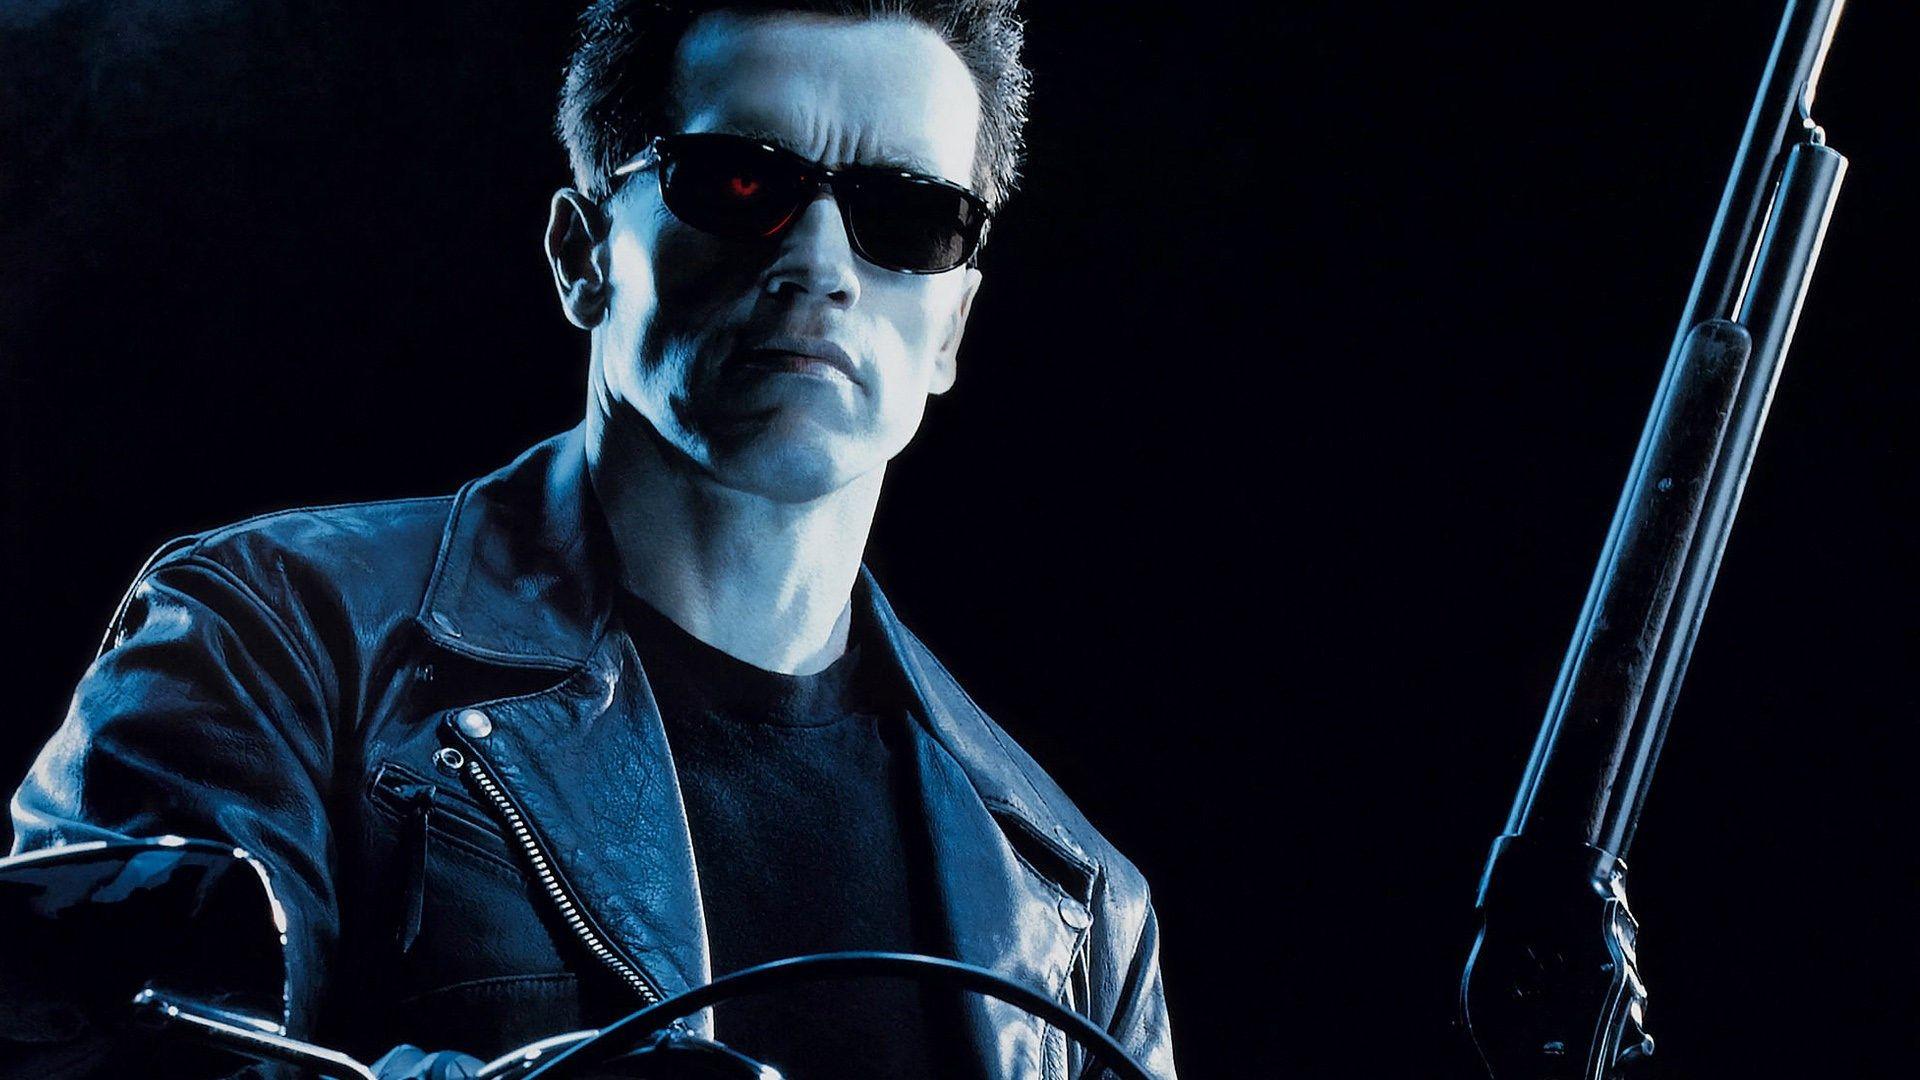 Terminator 2 Online Free